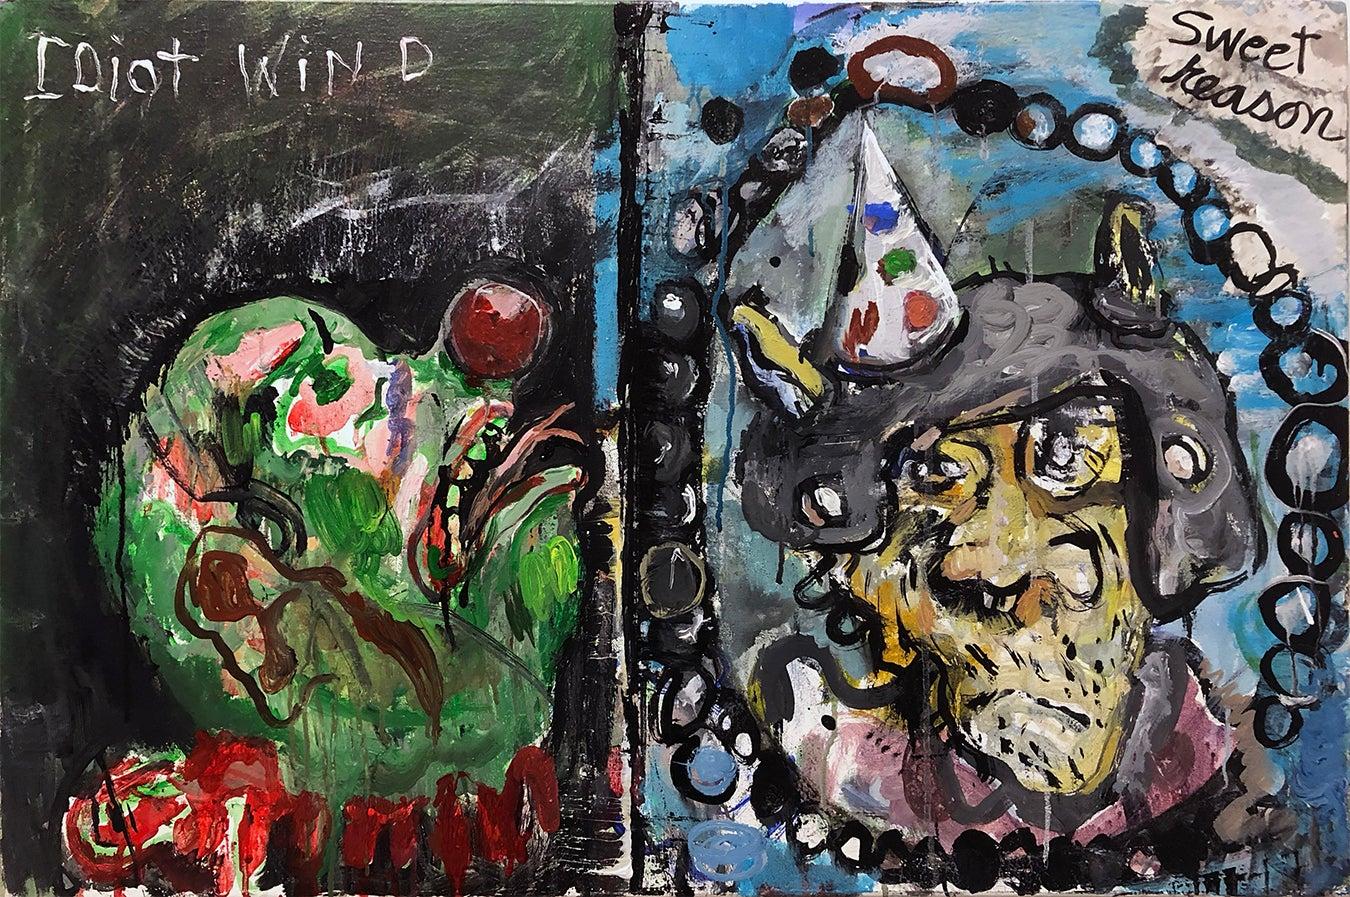 """Idiot Wind, Sweet Reason"", acrylic painting, duality, politics, humanity"